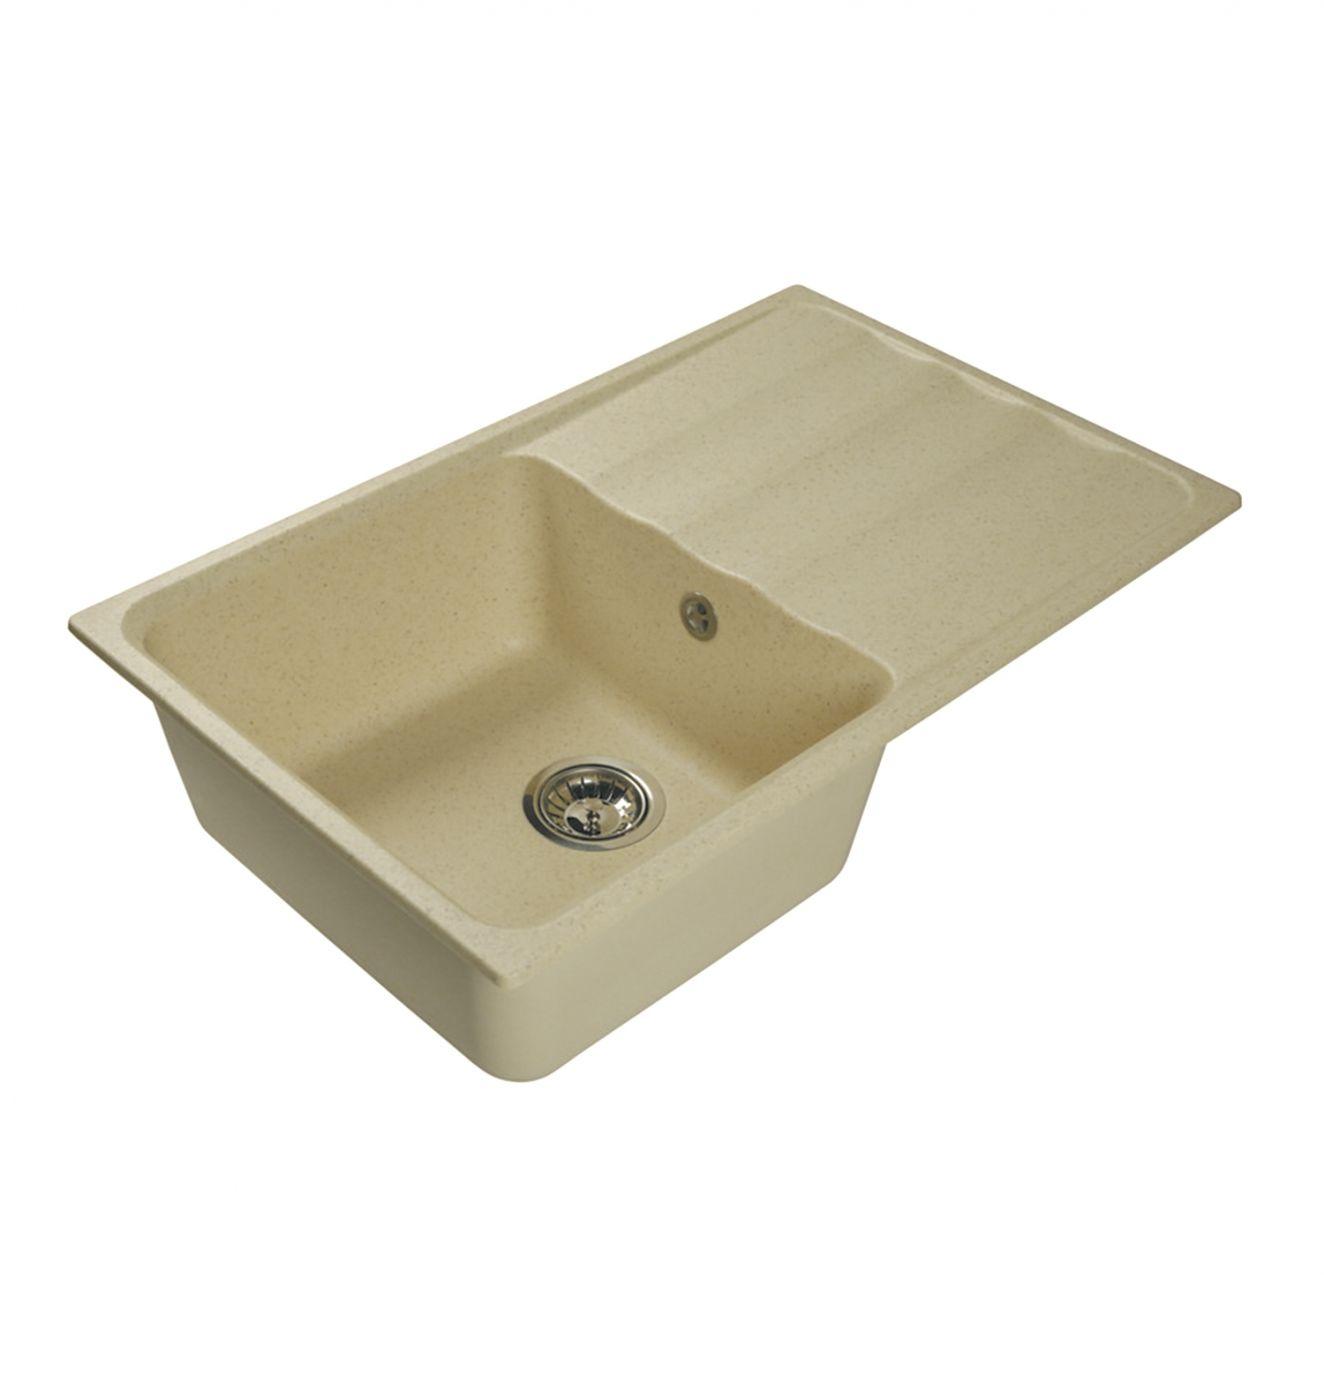 Врезная кухонная мойка LEX Lucerne 780 Ivory  78х49см искусственный мрамор RULE000112